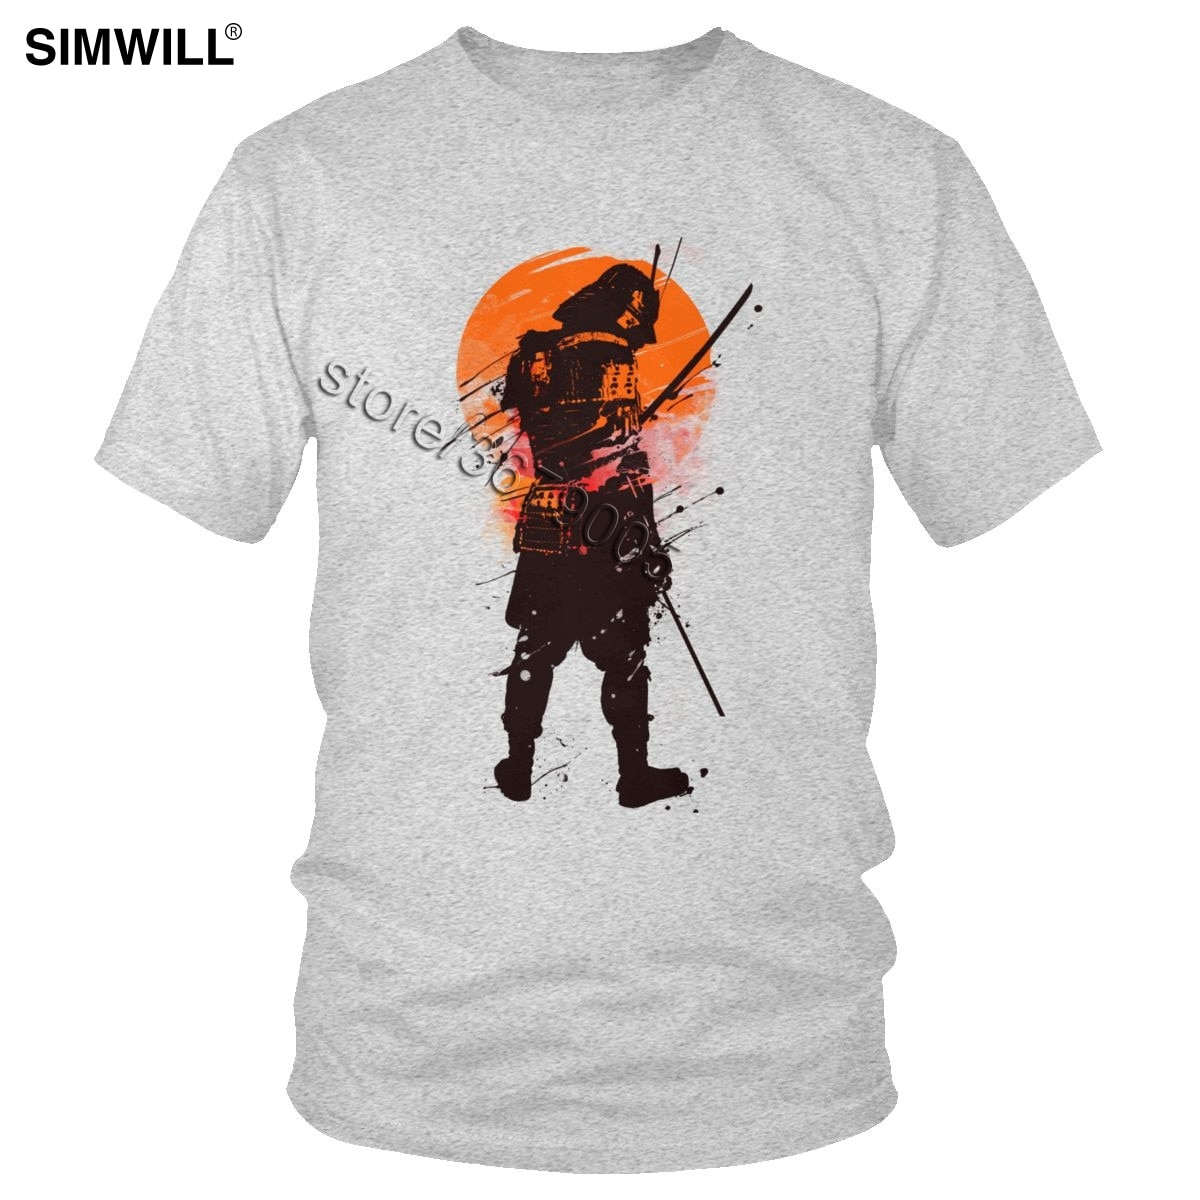 Letzten Samurai Stehenden Krieger T Shirts Mode Lässig Baumwolle T-stück Männer Short Sleeve Crew Neck Japanischen Tugenden Bushido T-Shirt